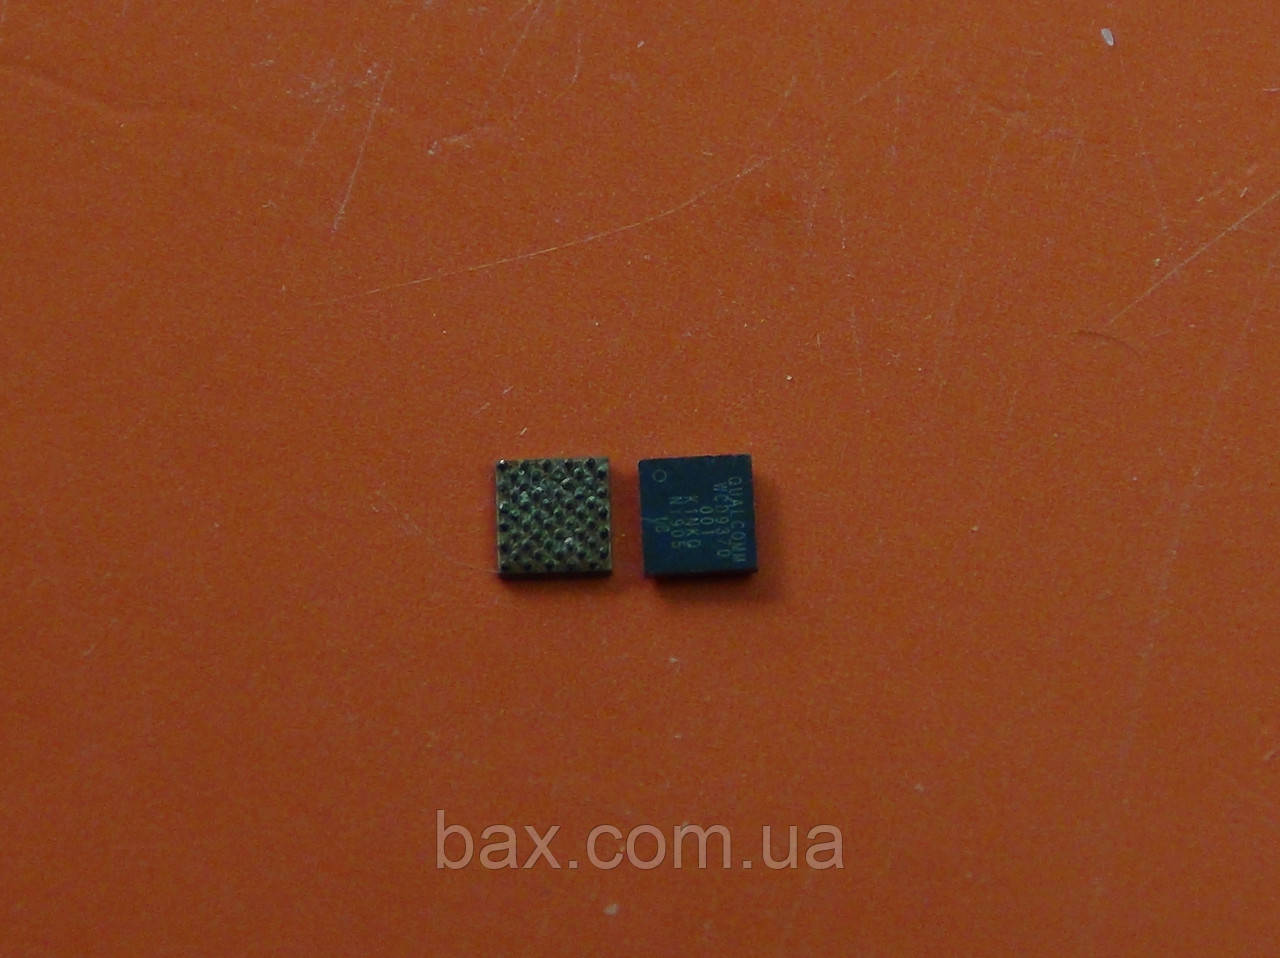 Микросхема контроллер питания WCD9370 Оригинал Китай